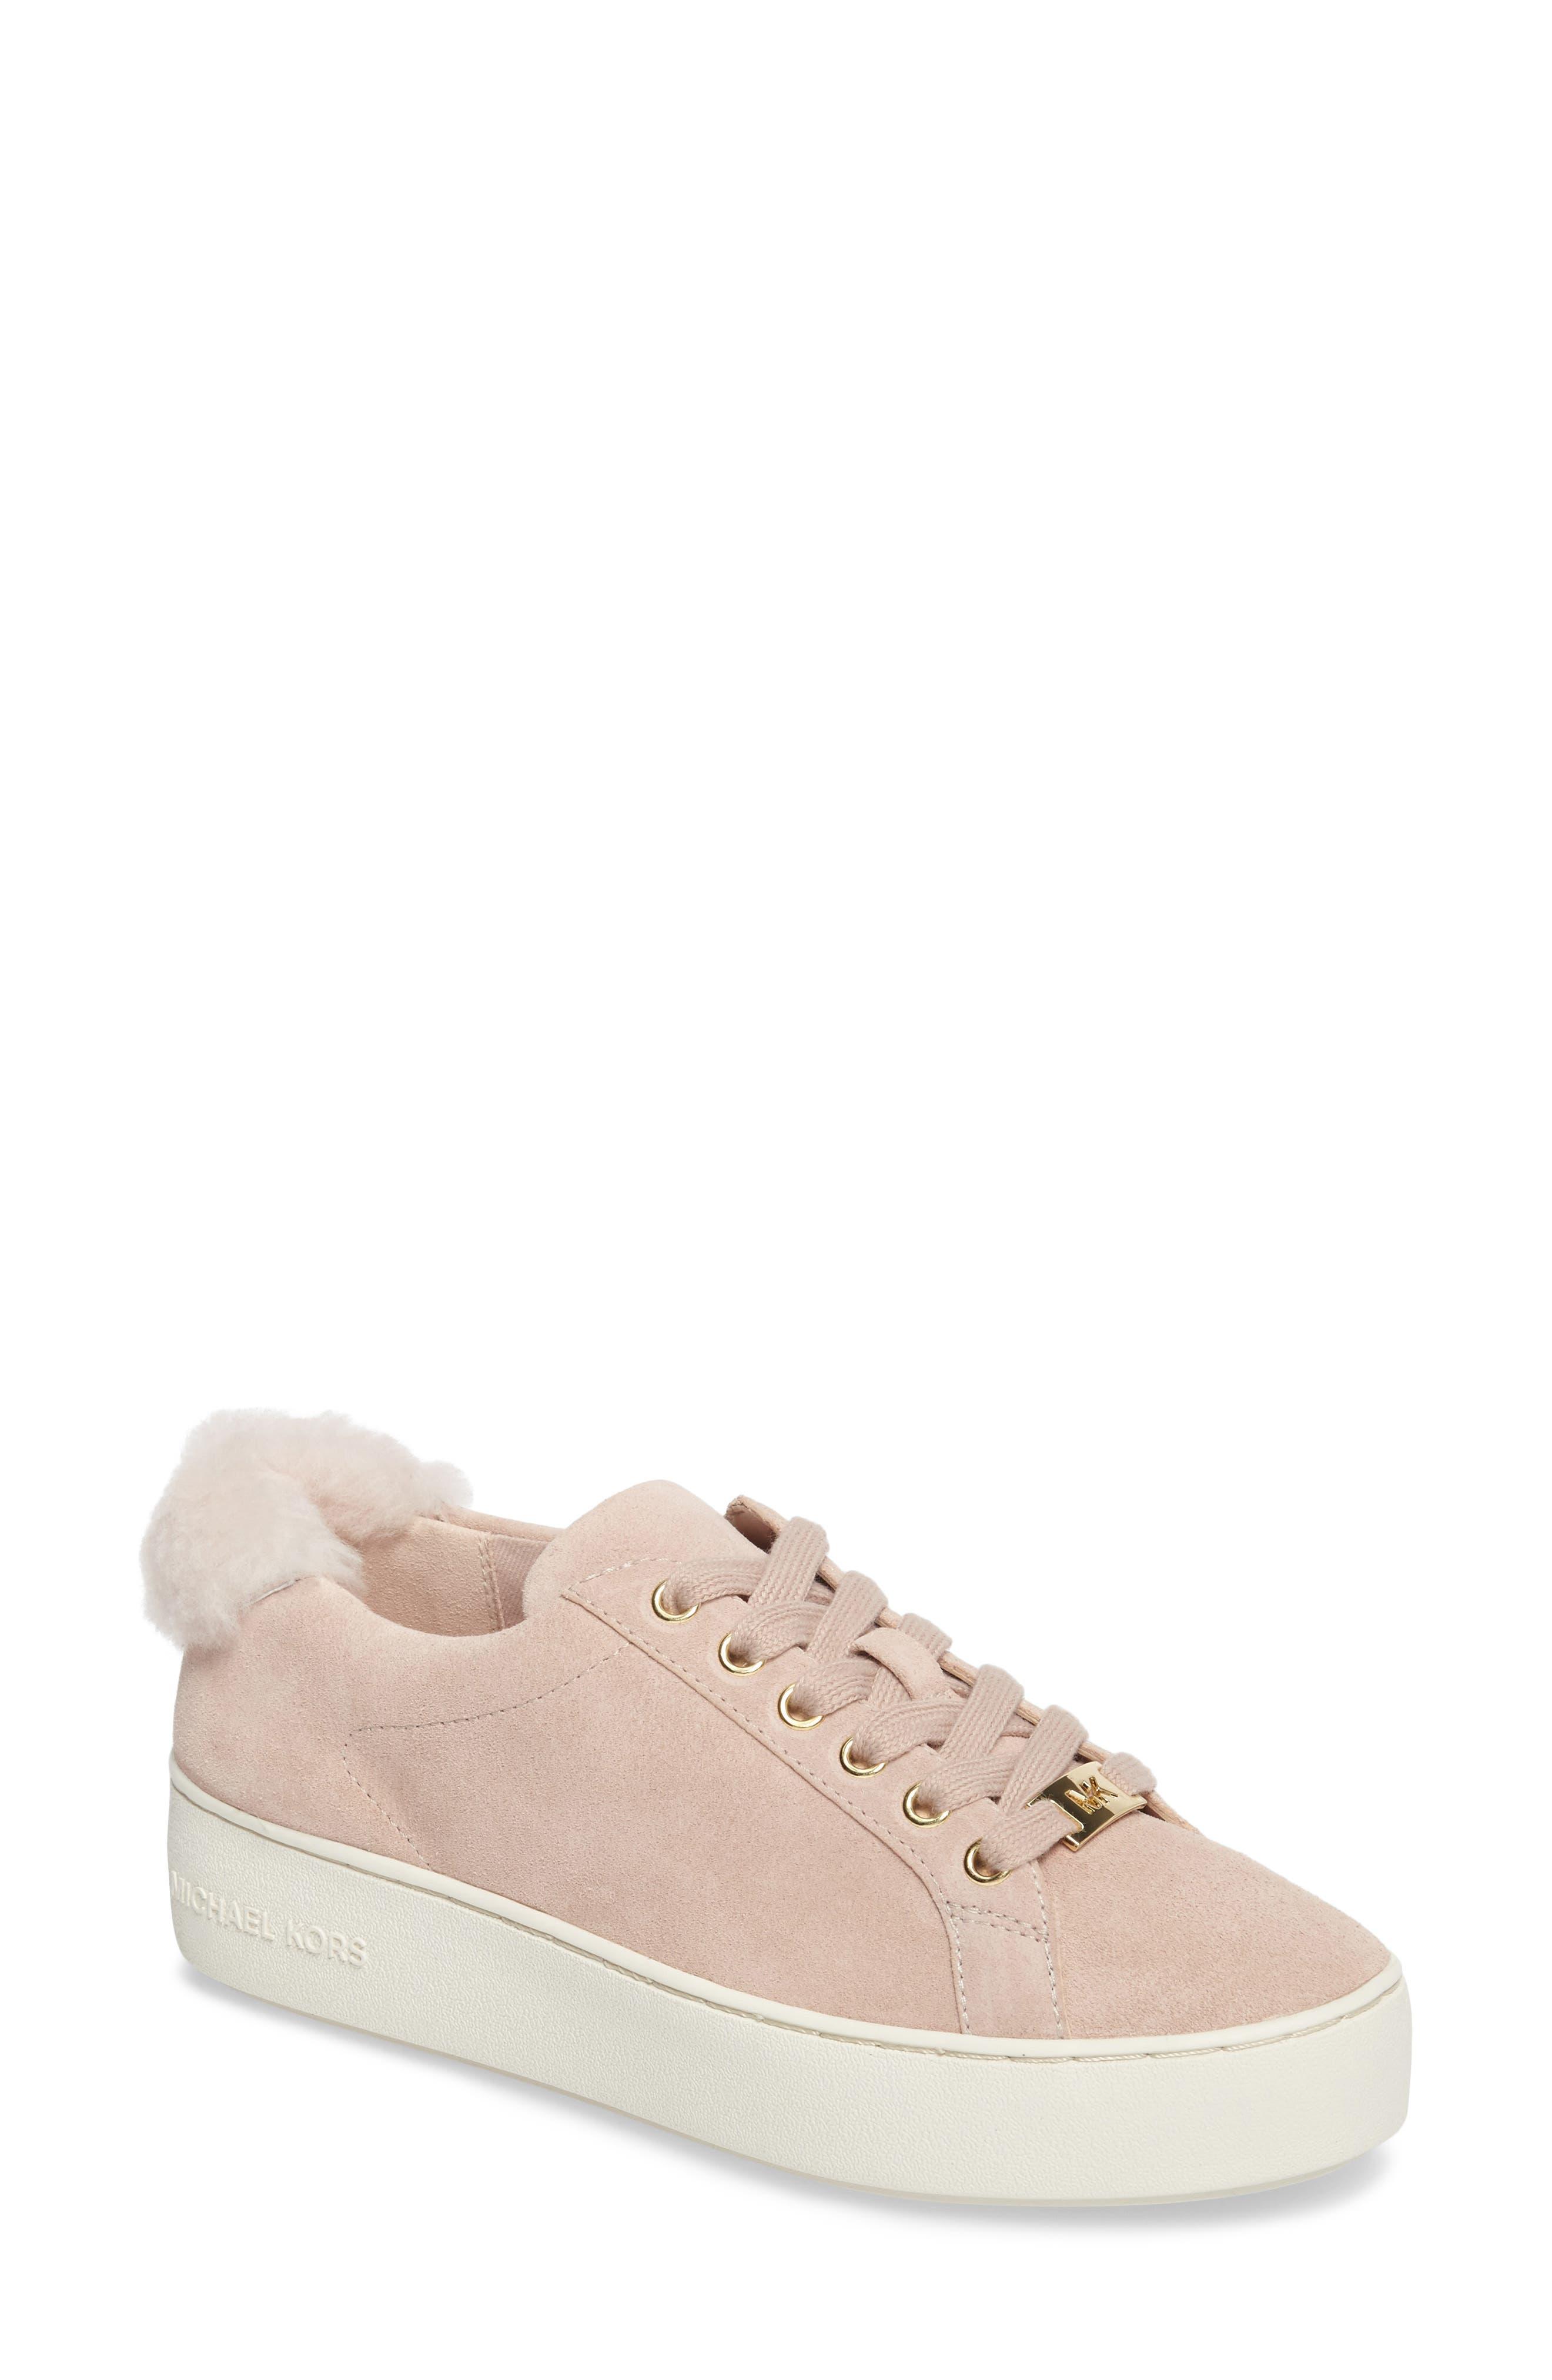 Poppy Platform Sneaker,                         Main,                         color, 651